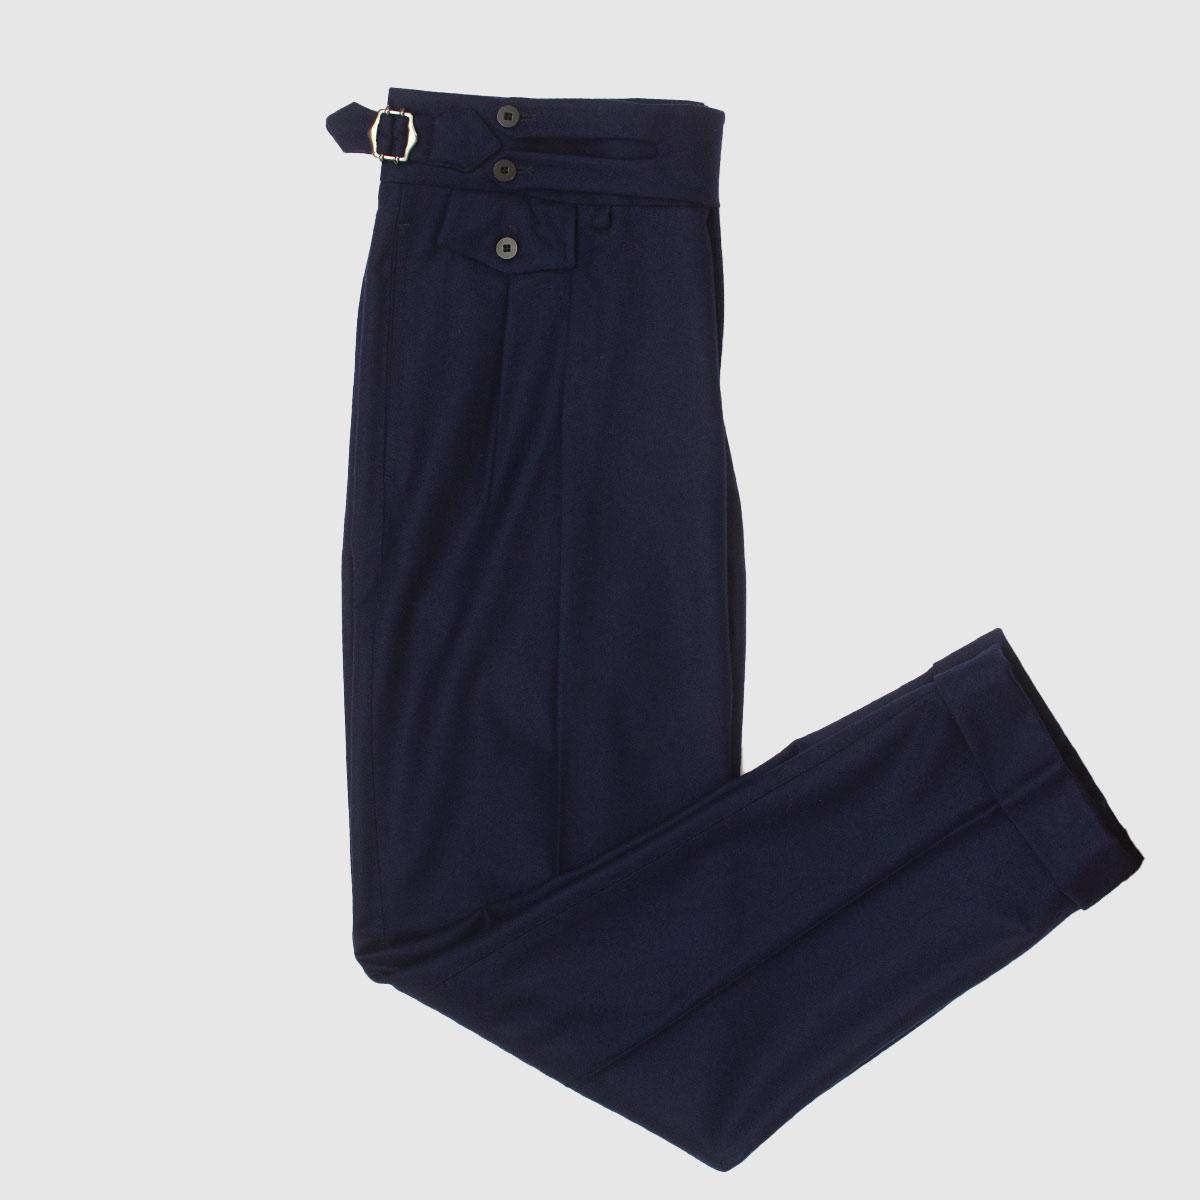 Pantalone in Lana blu doppia pience